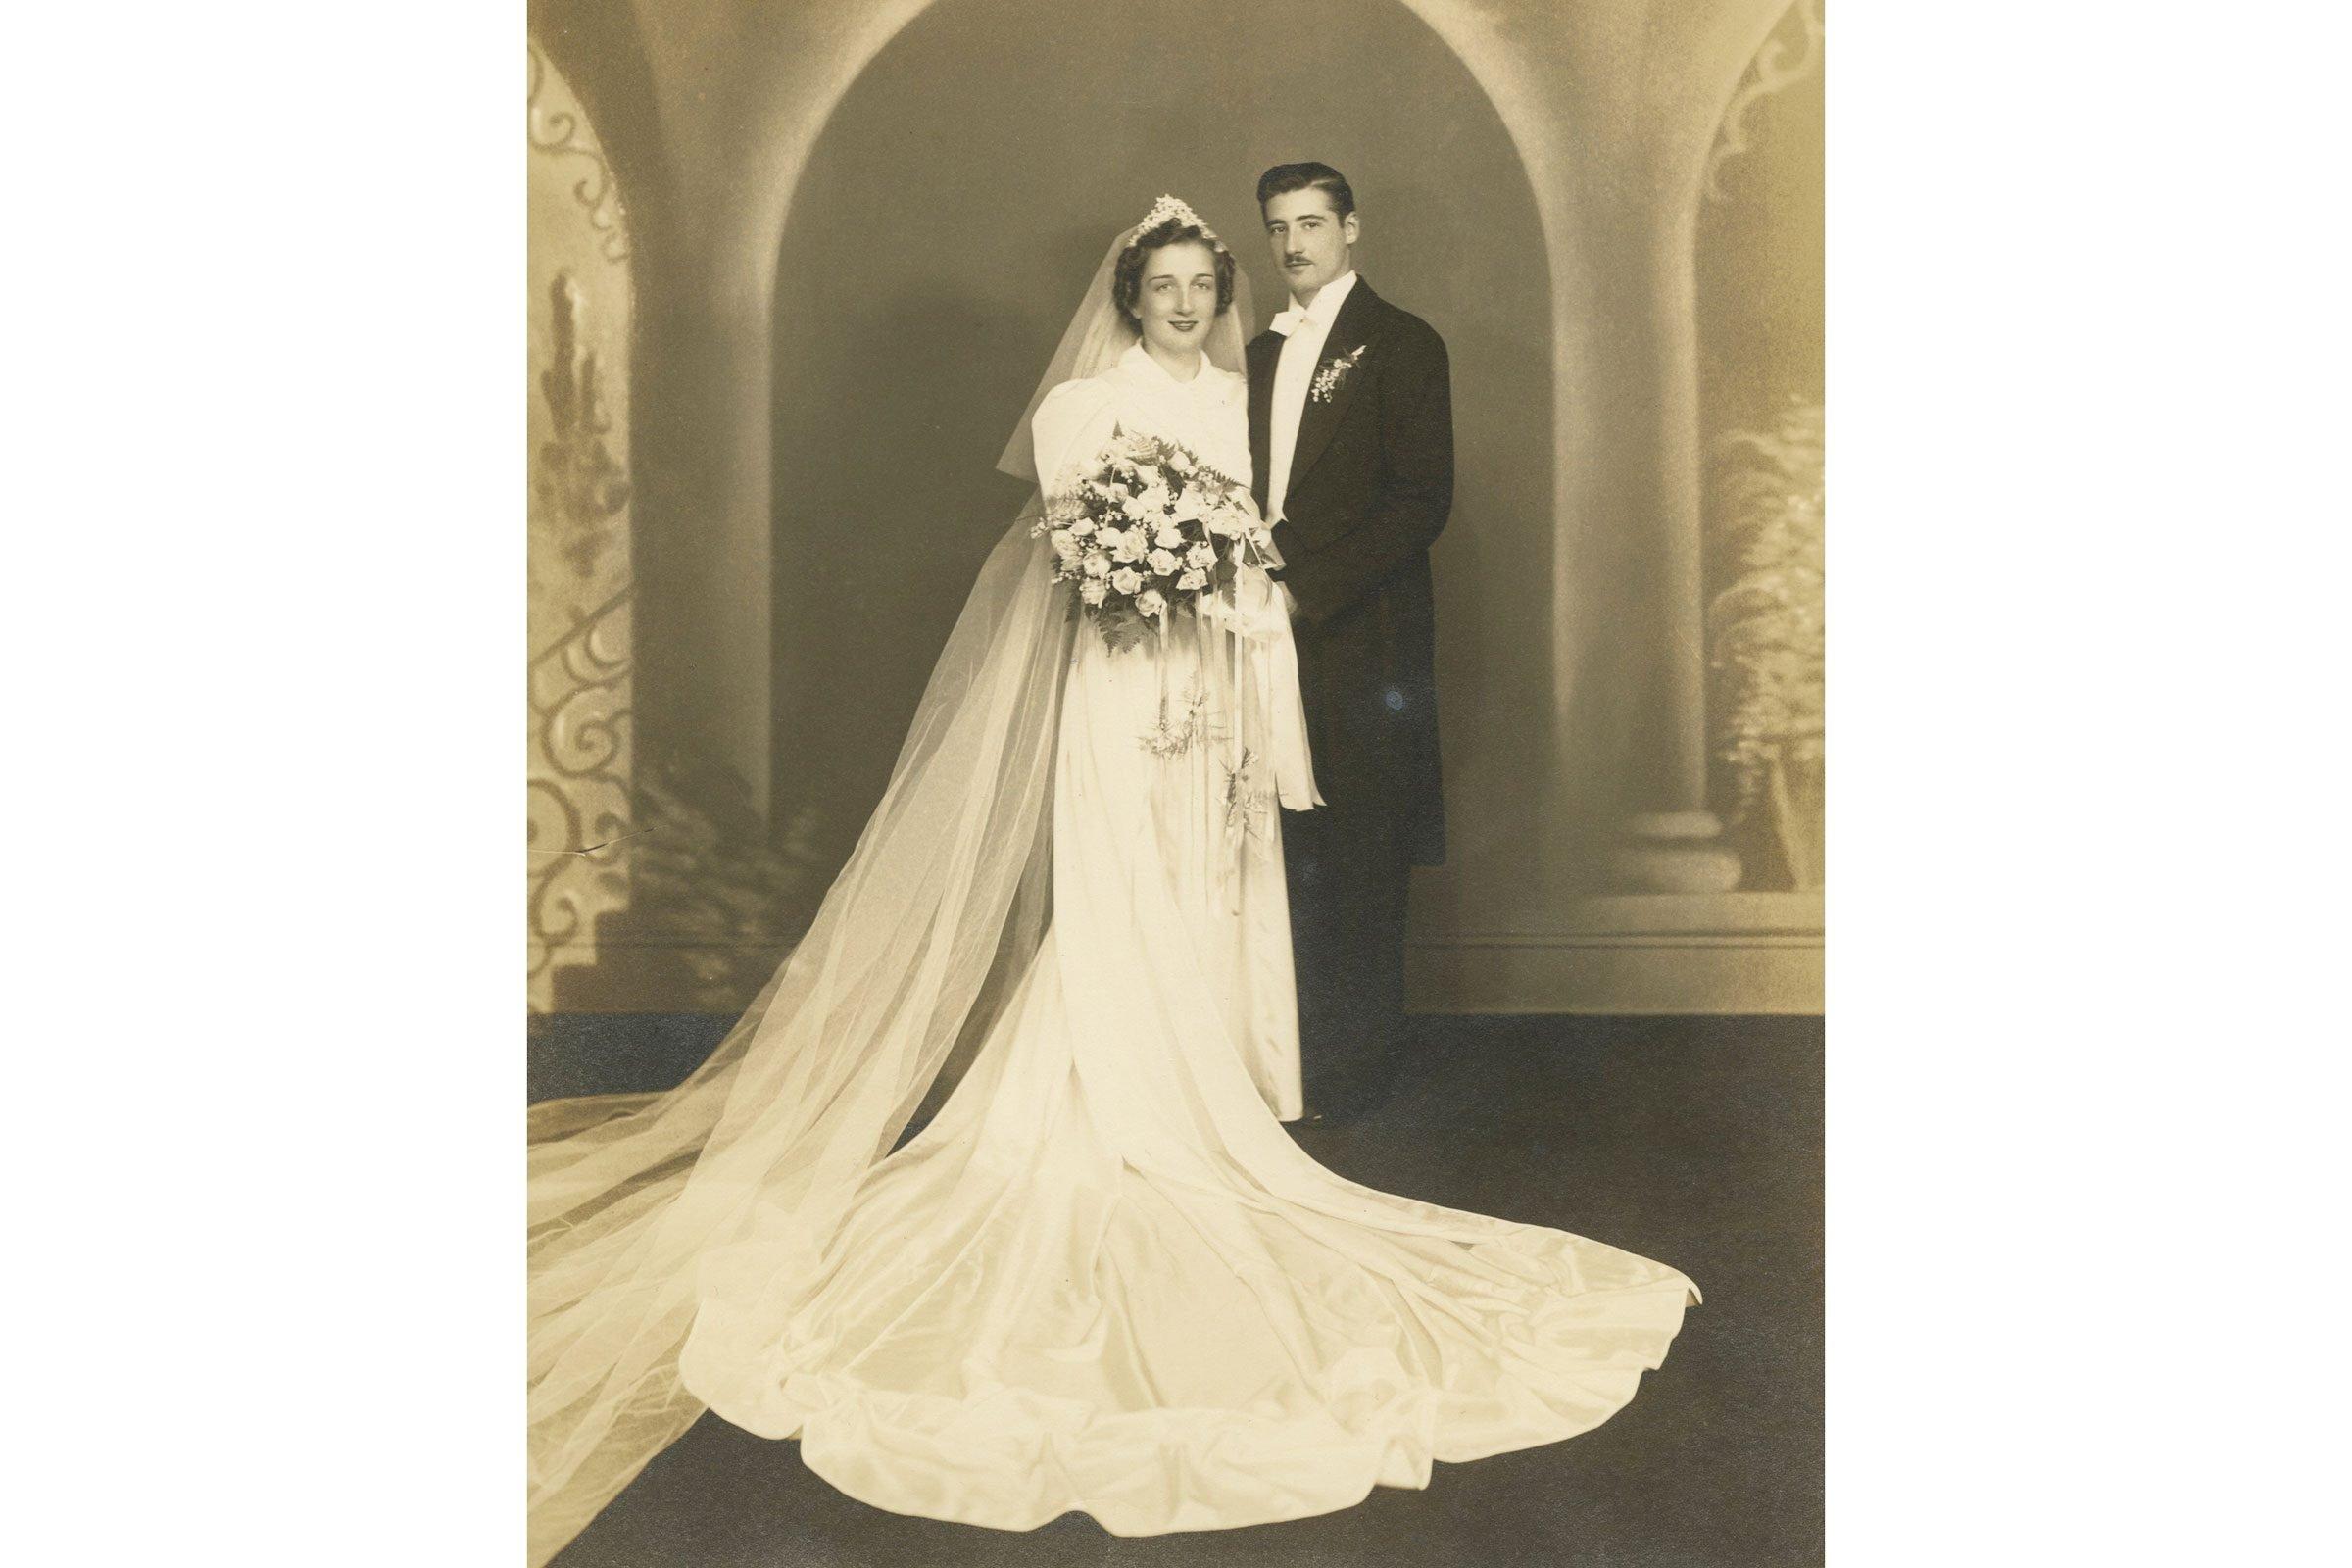 Wedding Dress Photos - us62